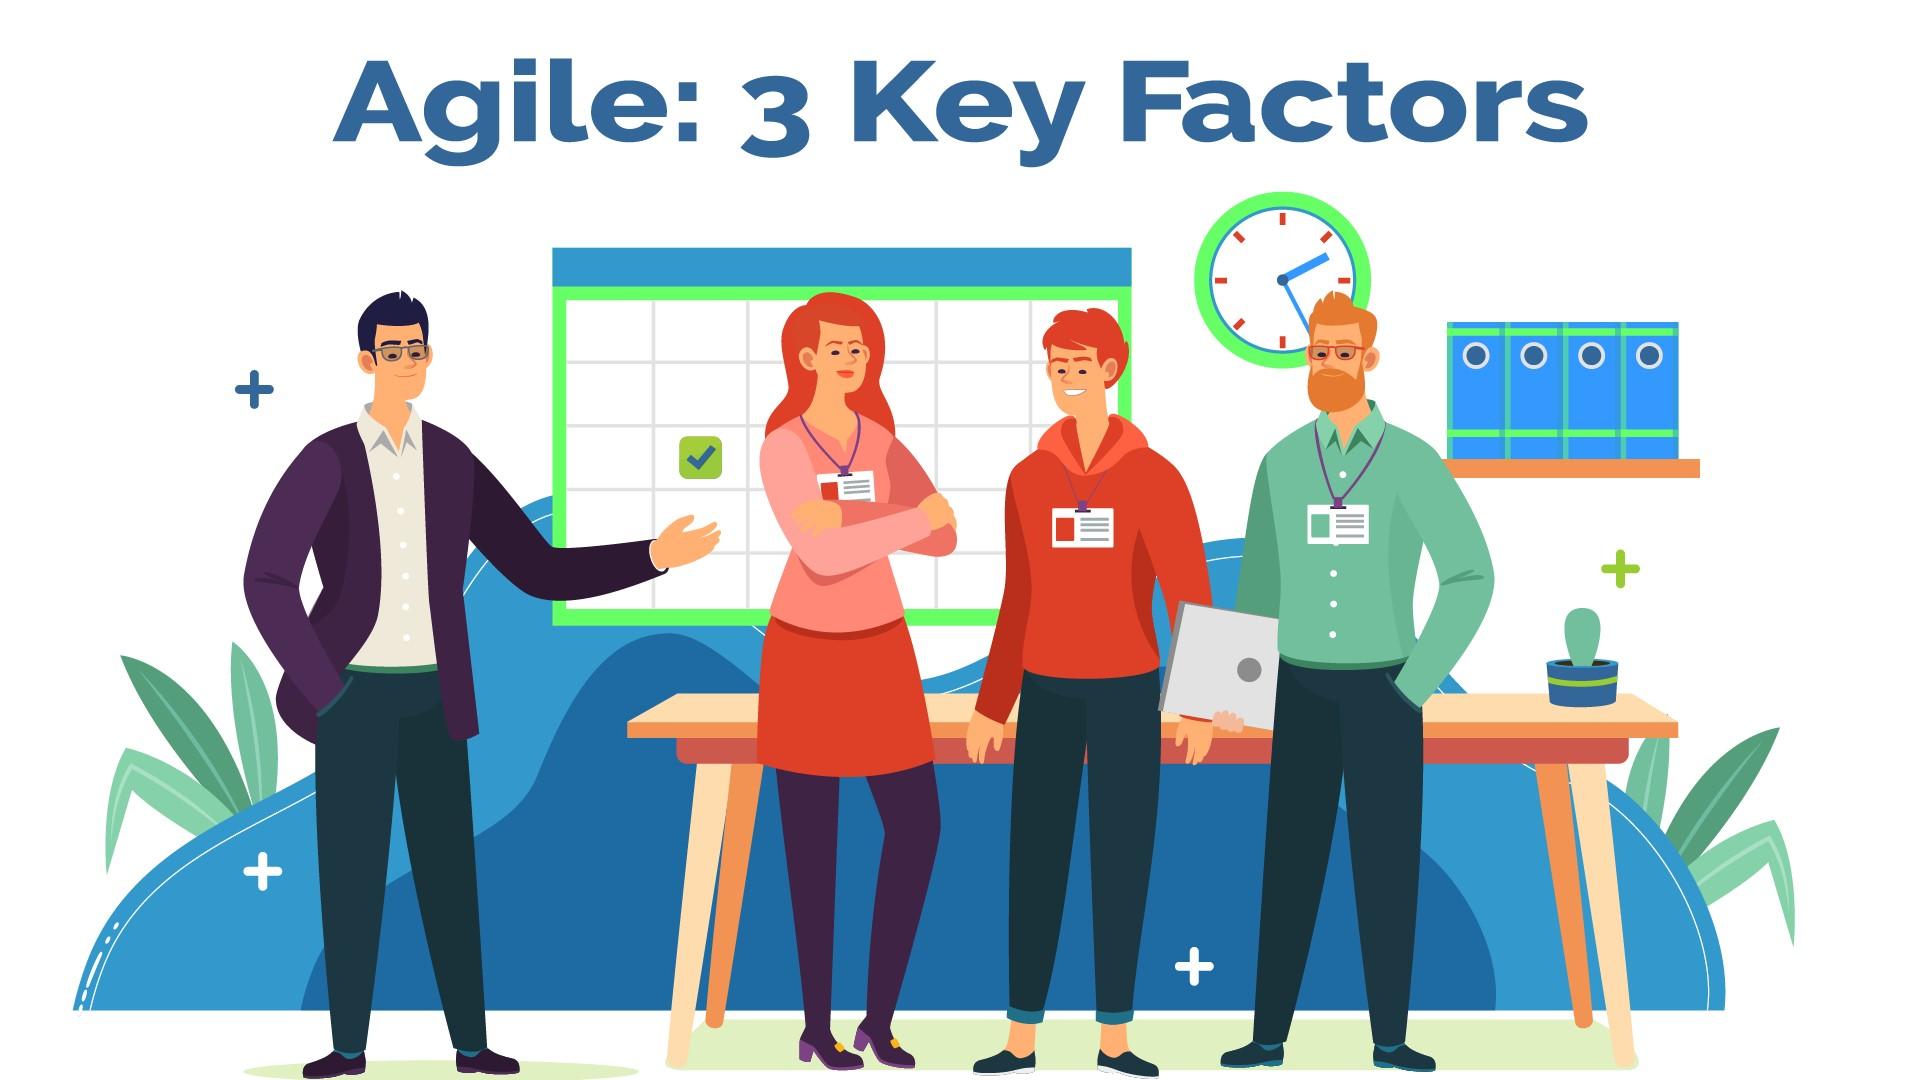 Agile- 3 Key Factors